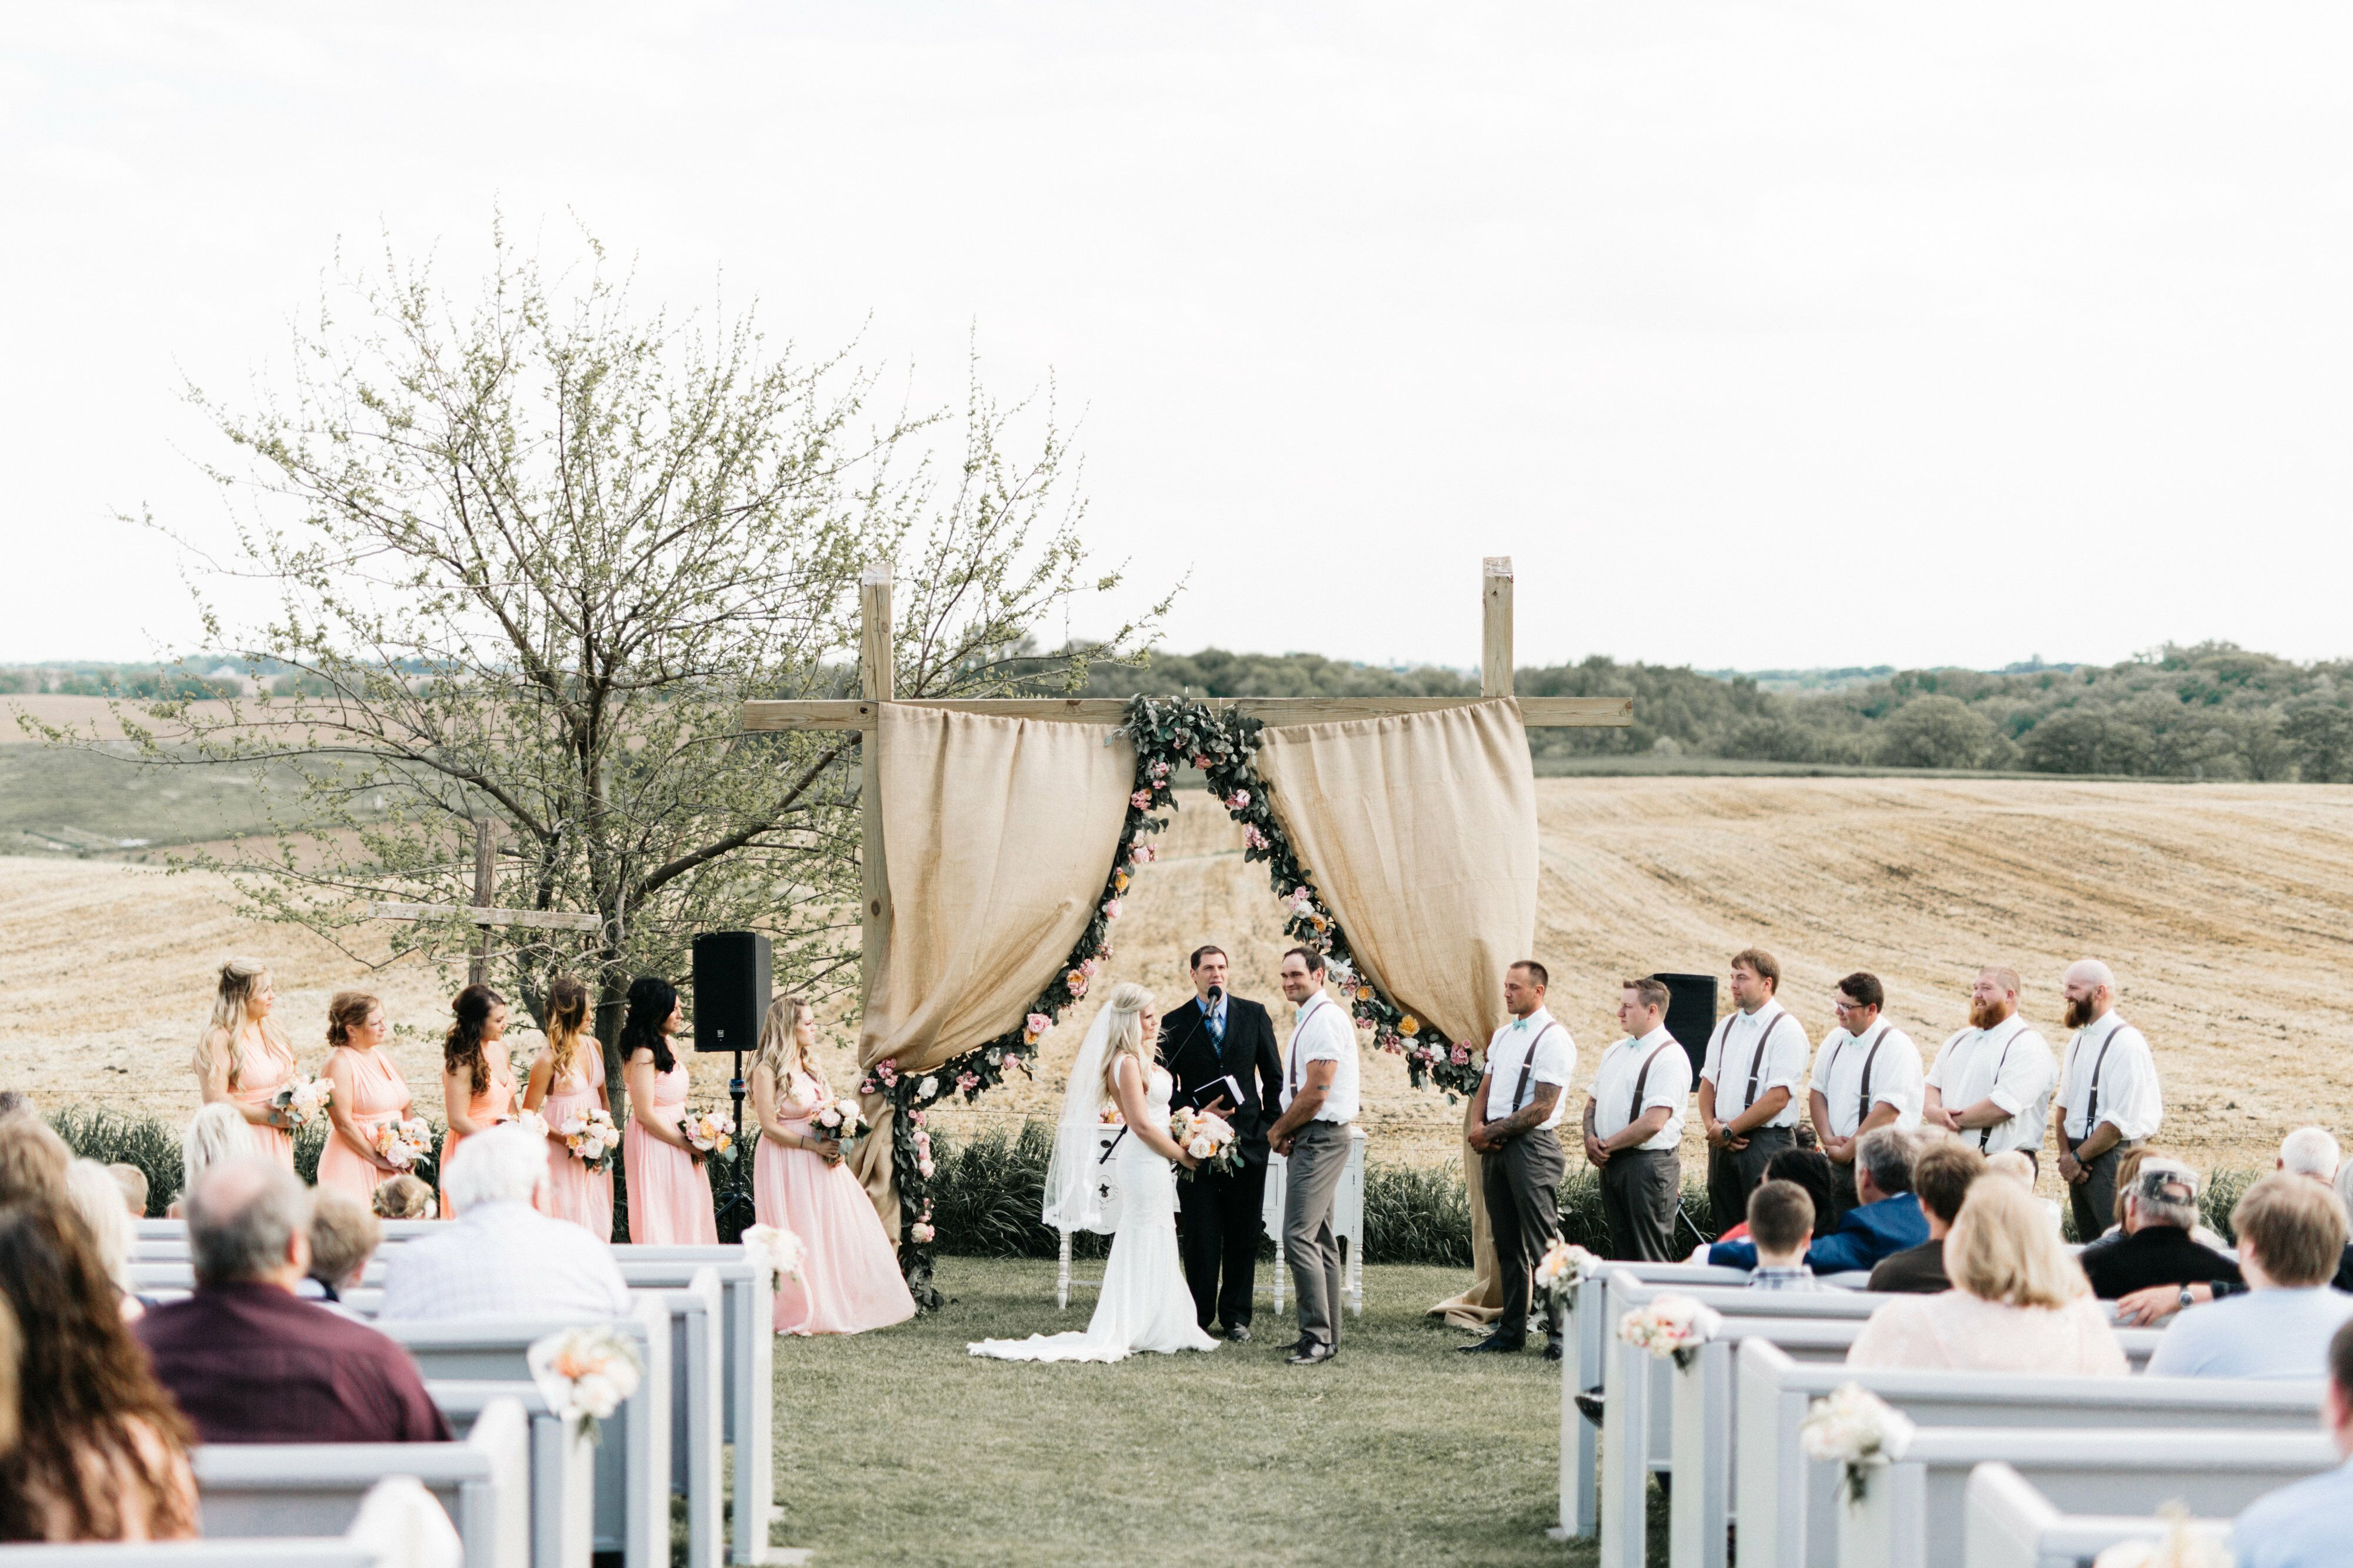 Rustic Elegance Wedding Coordination & Rustic Rental - Plymouth, MN